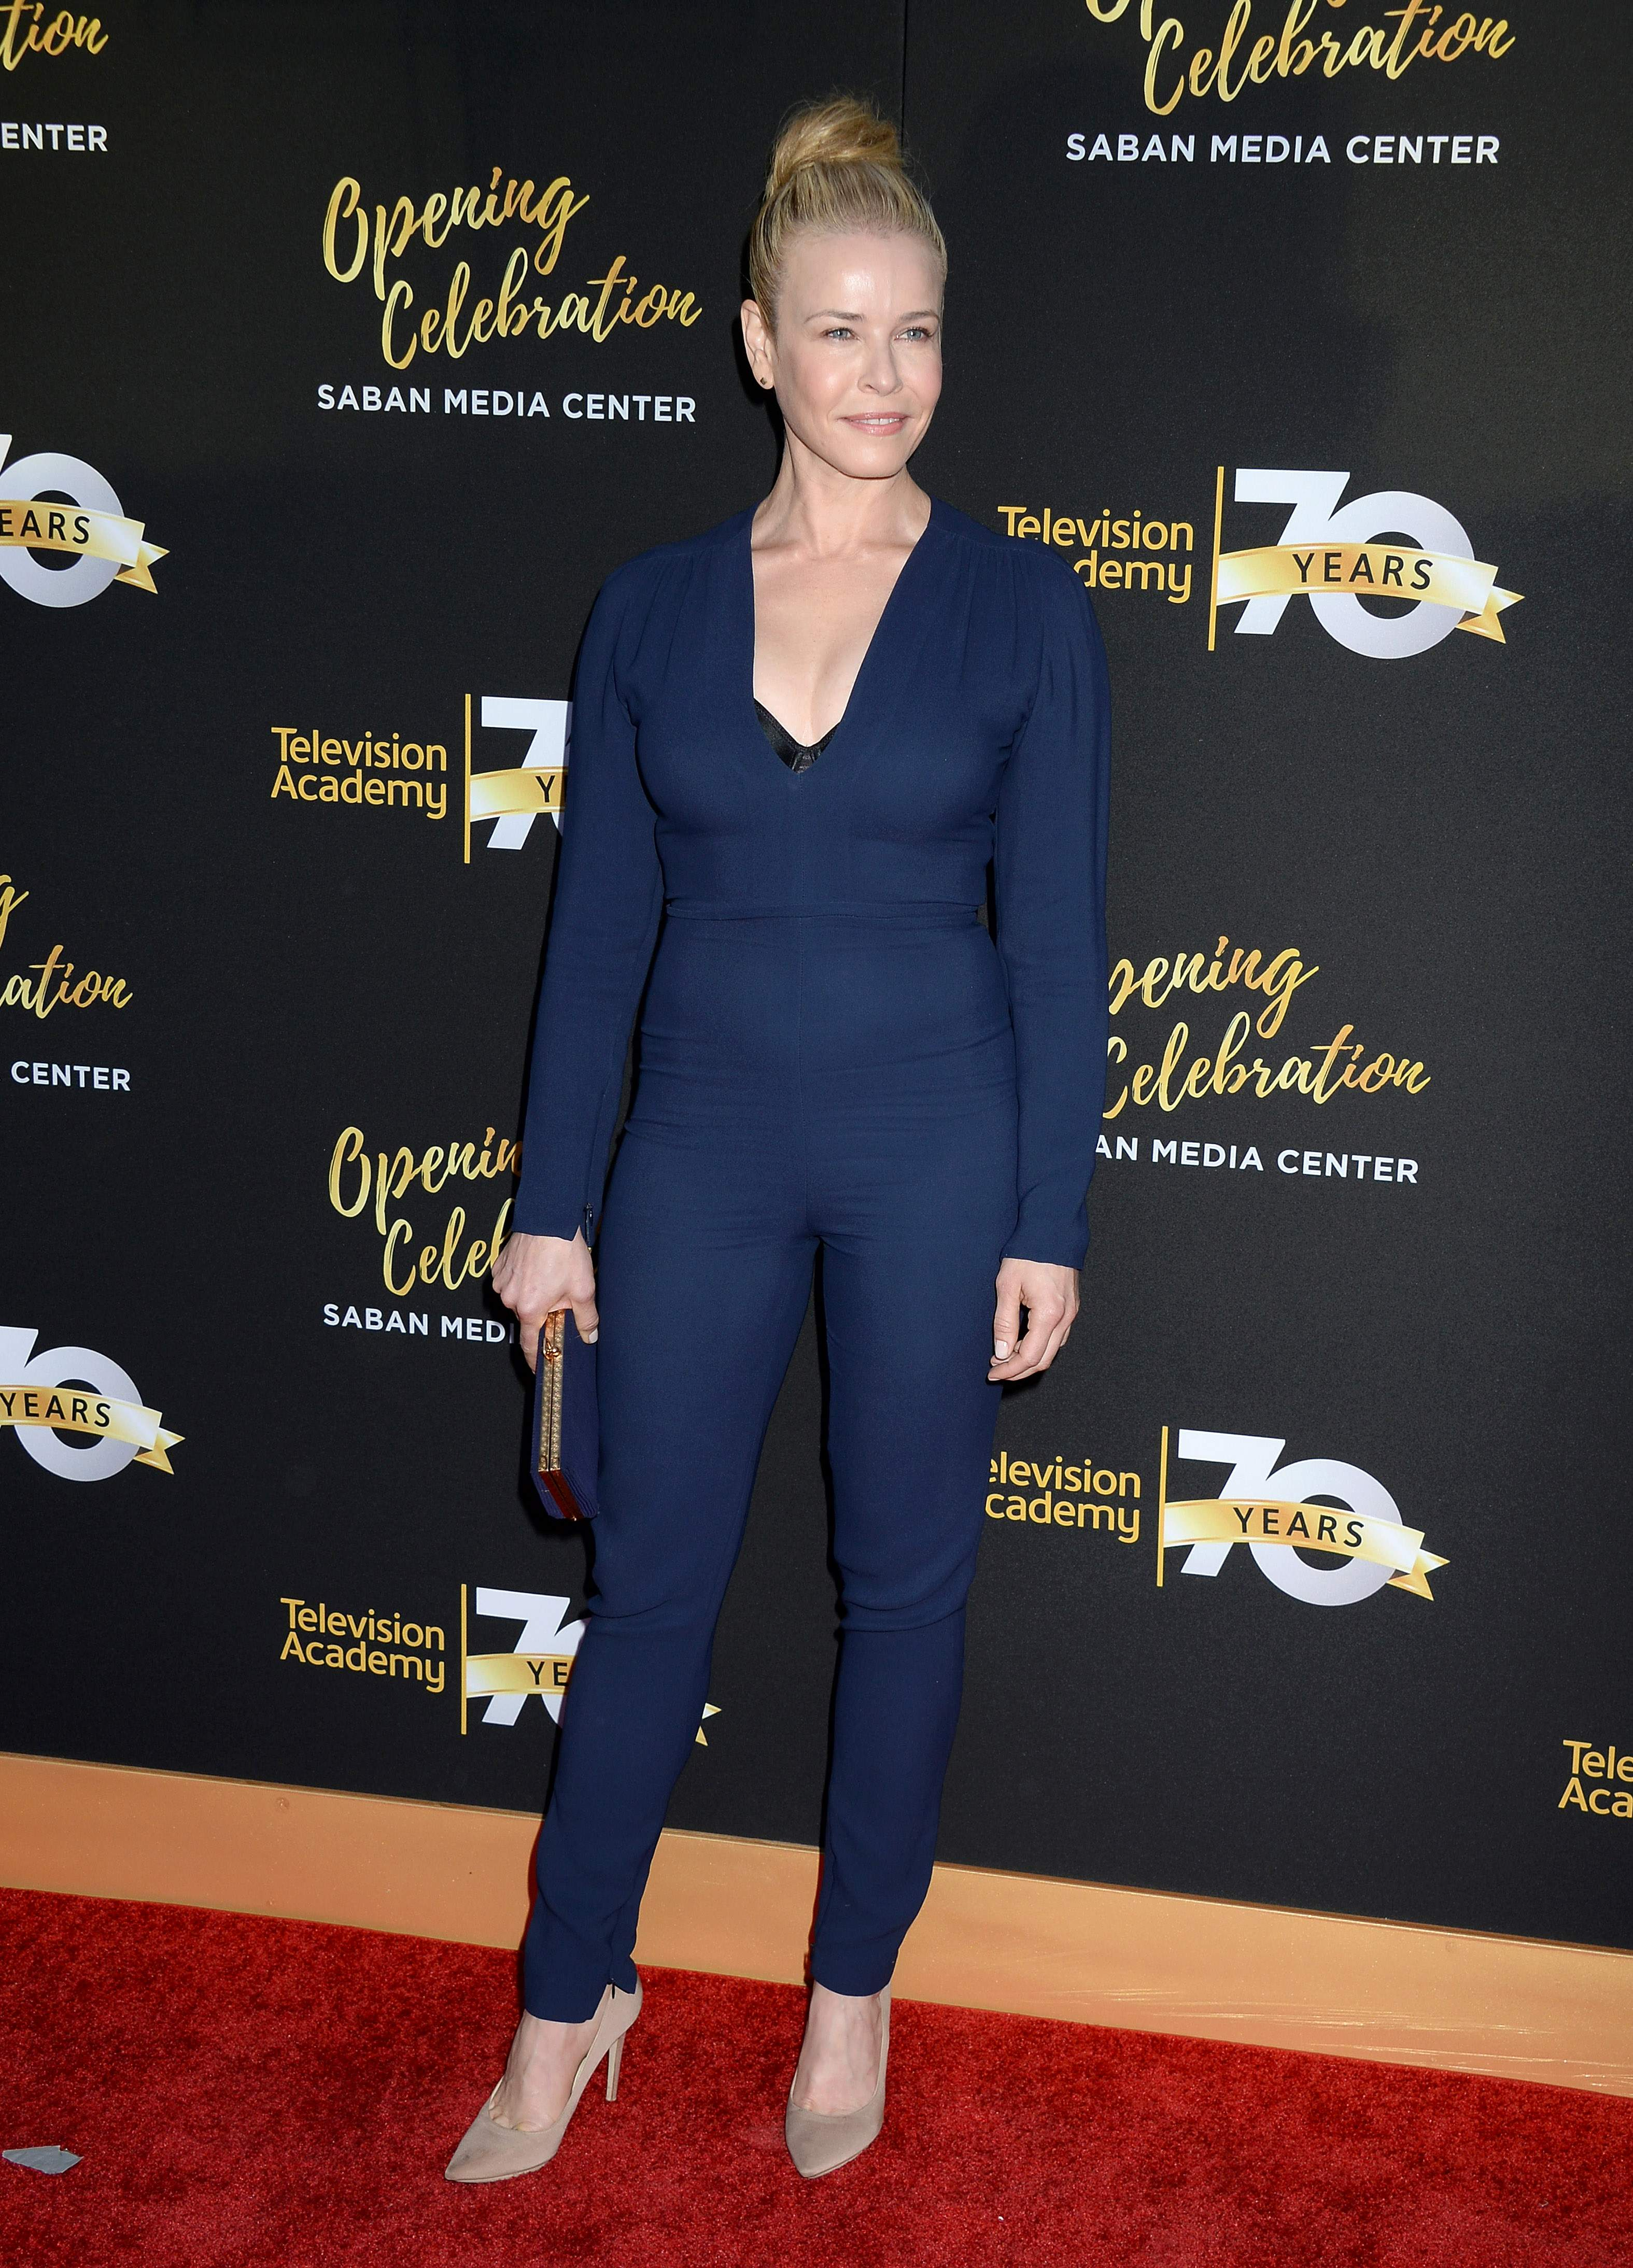 Chelsea Handler Television Academy's 70th Anniversary Gala, Los Angeles June 2-2016 005.jpg